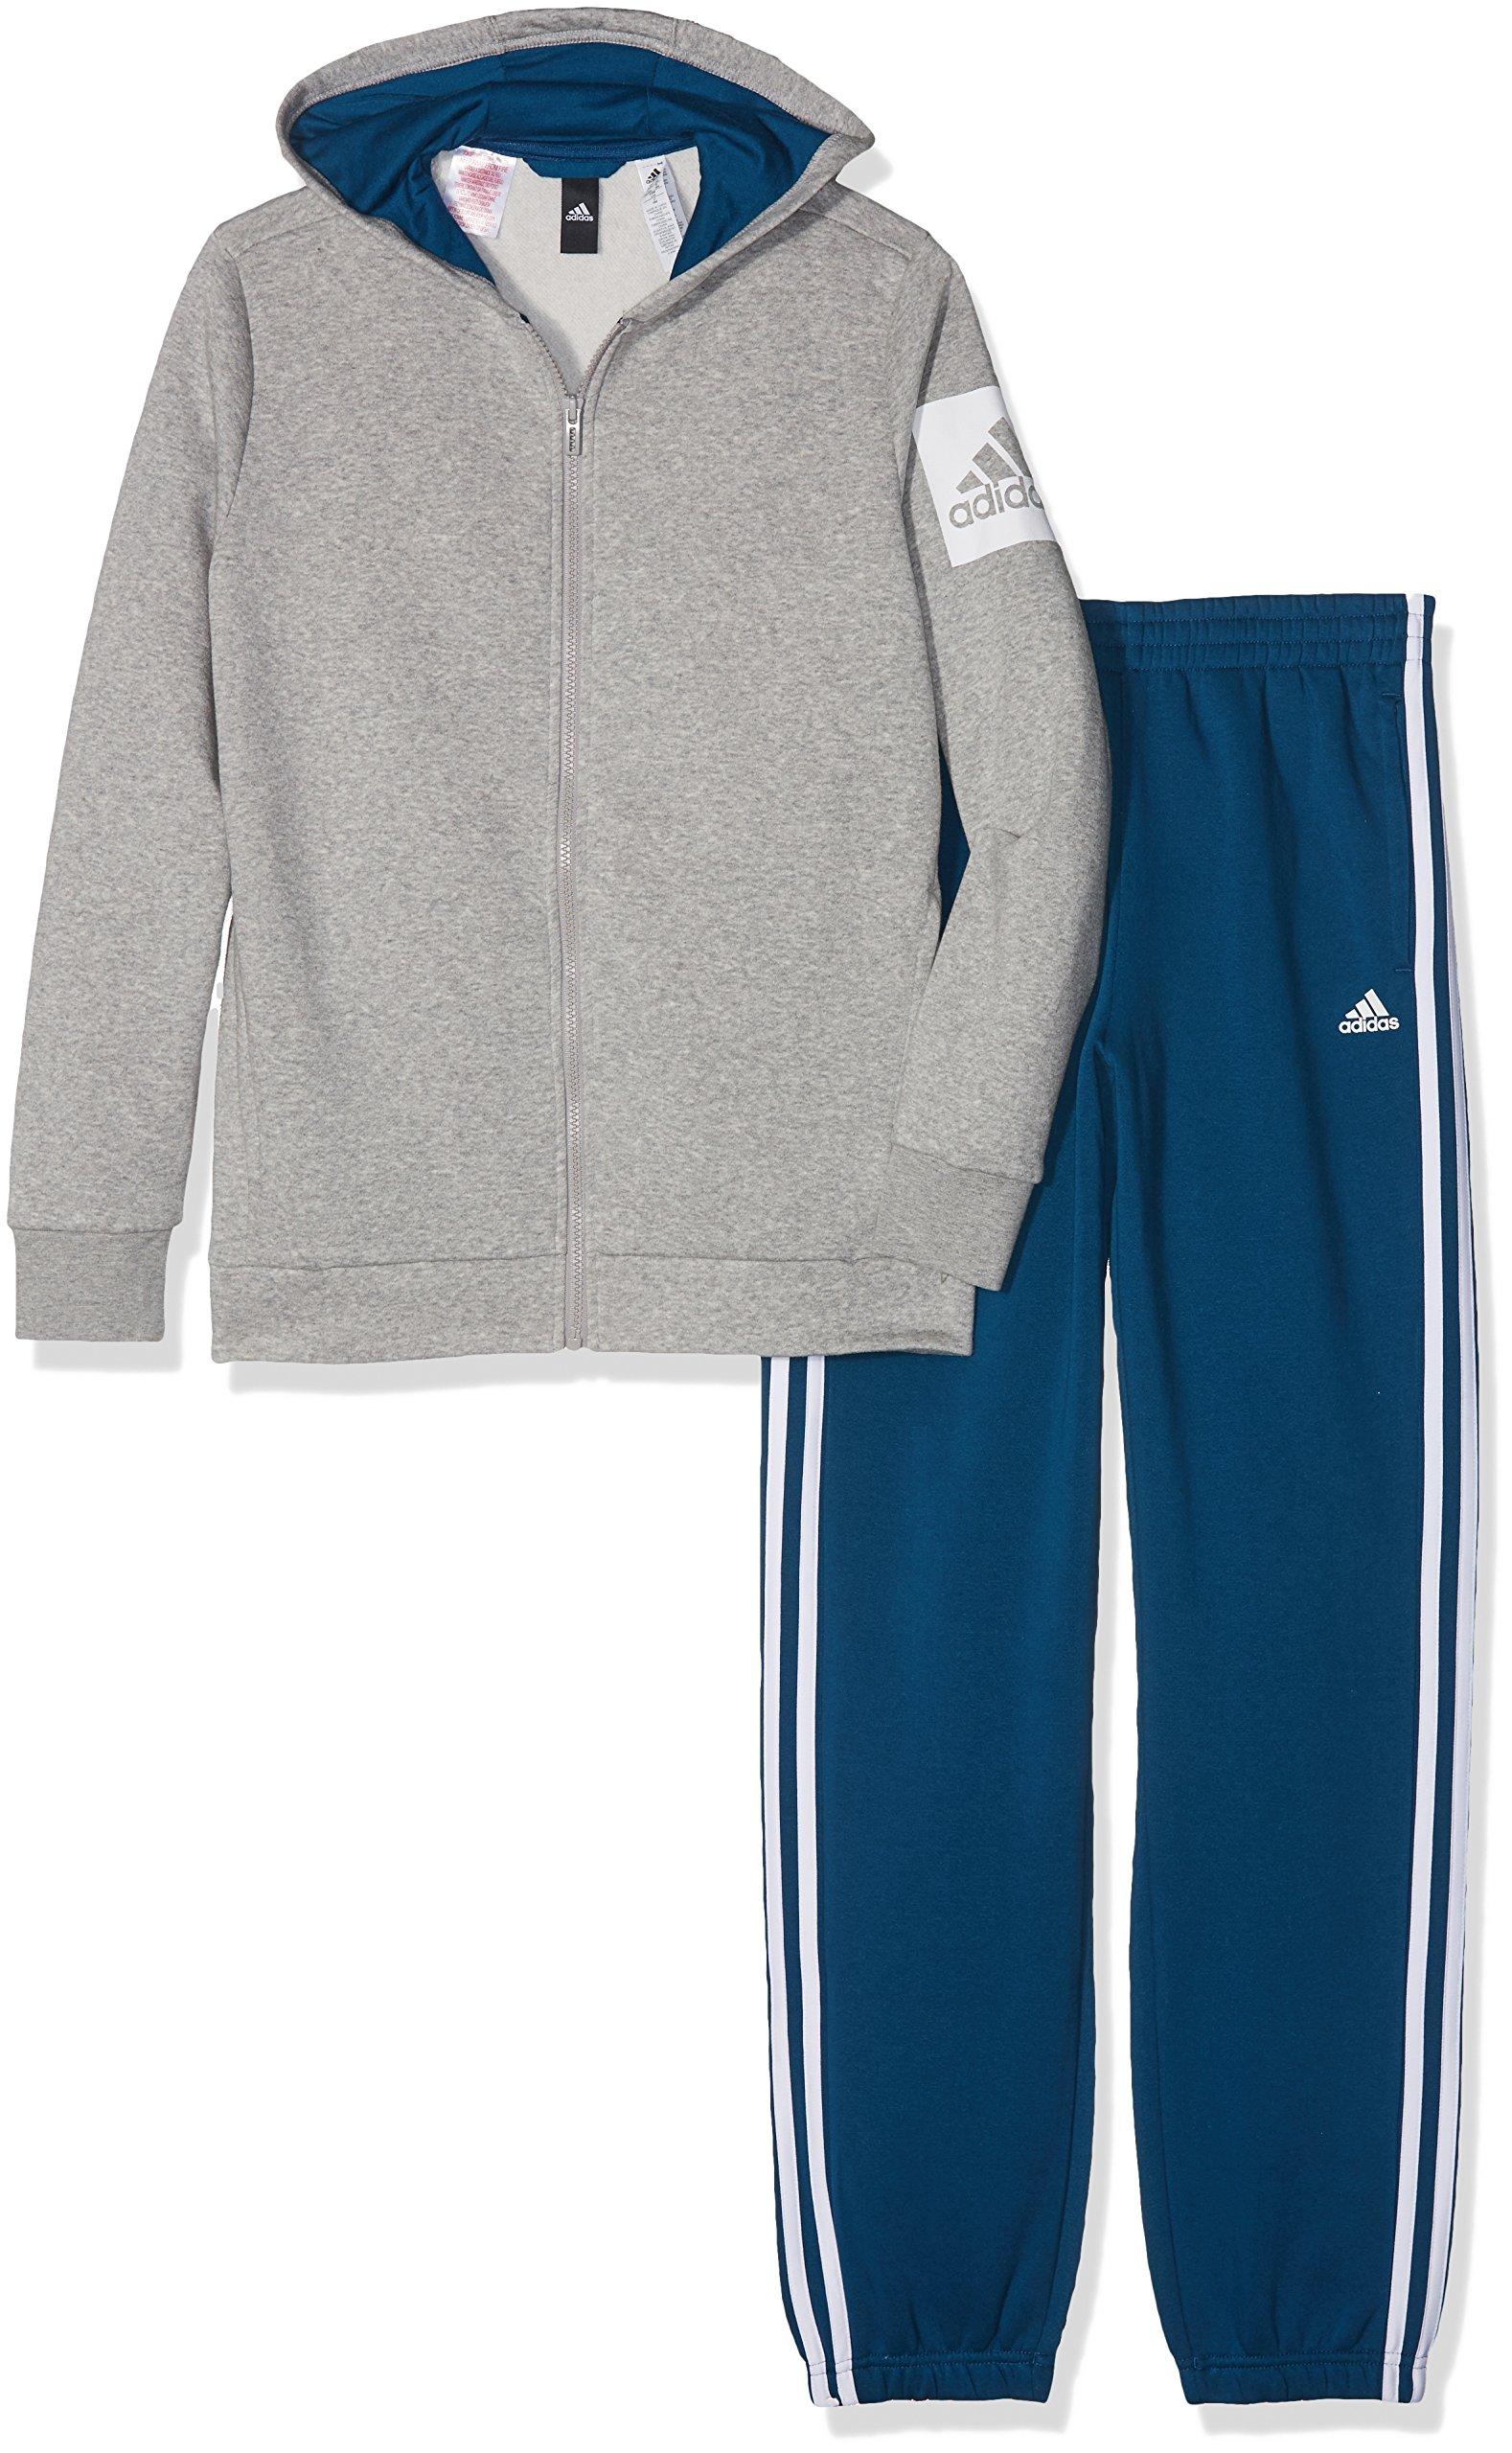 adidas Boys Tracksuit Kids Athletics Hojo Training Running Blue Gym New (152/11-12 Years) by adidas (Image #1)